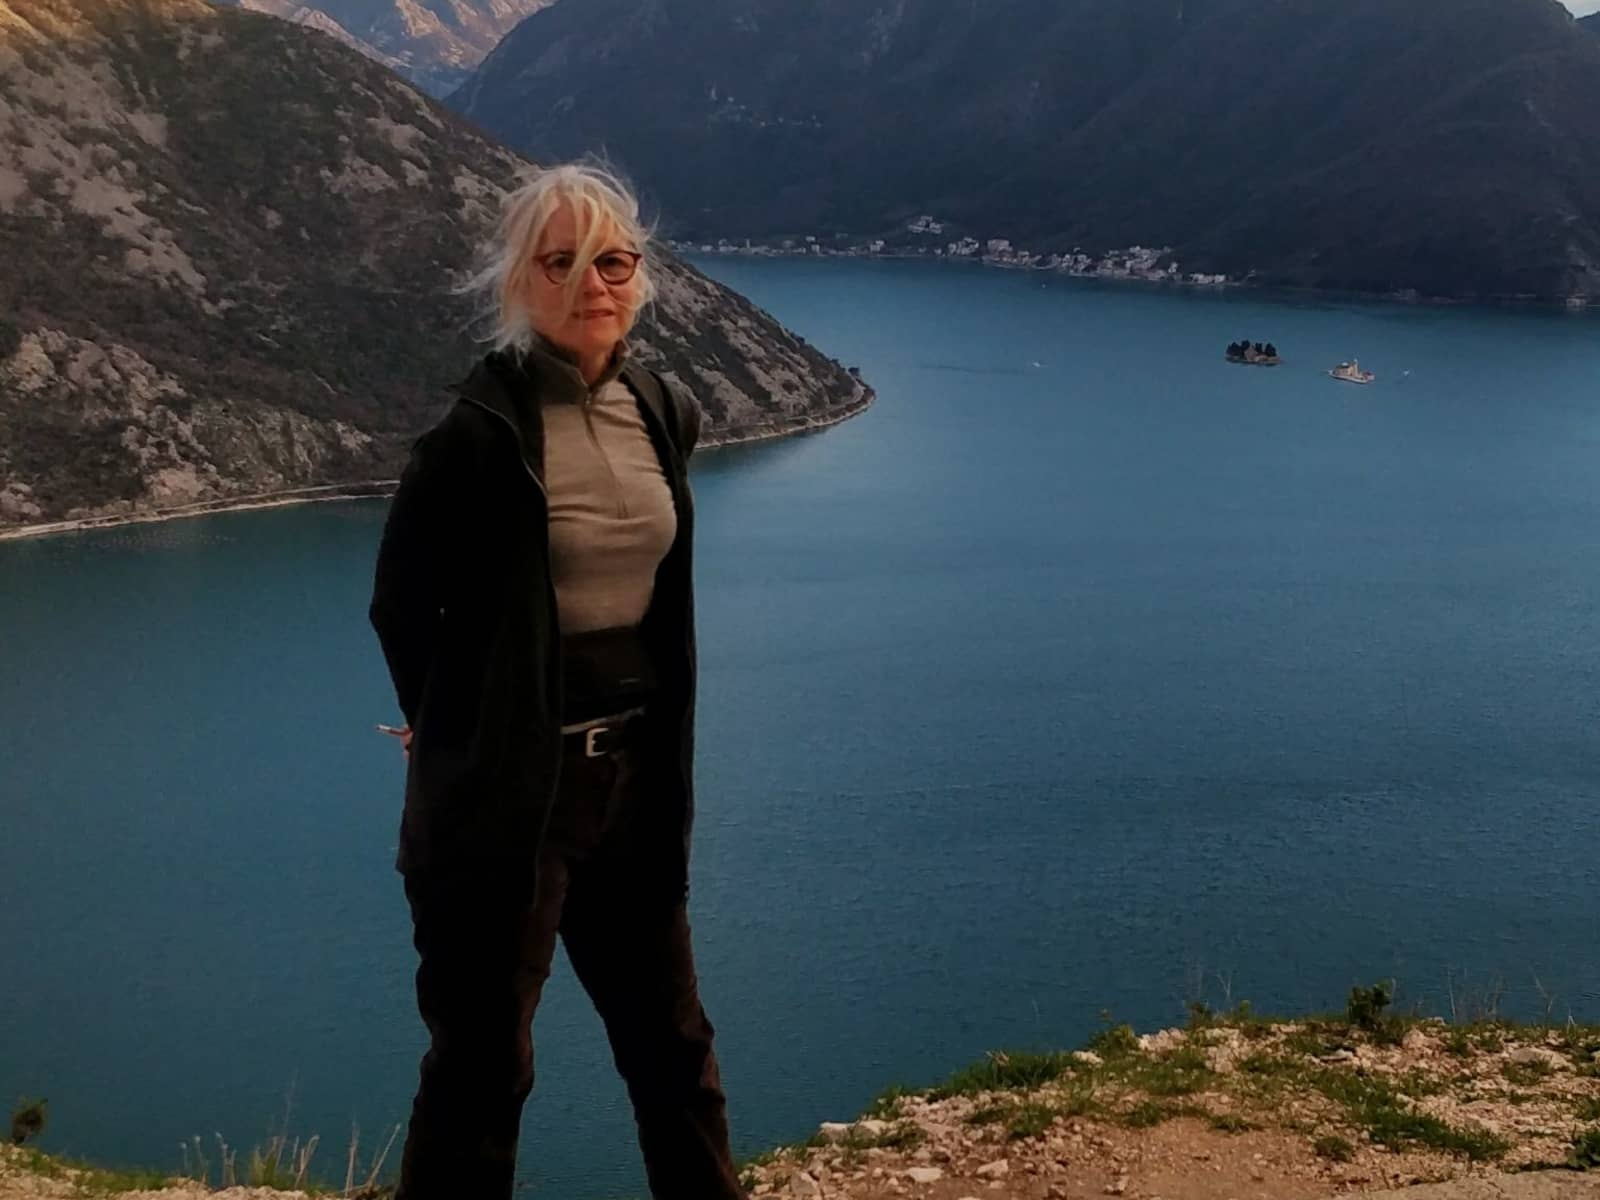 Patti    (patricia) from Kelowna, British Columbia, Canada